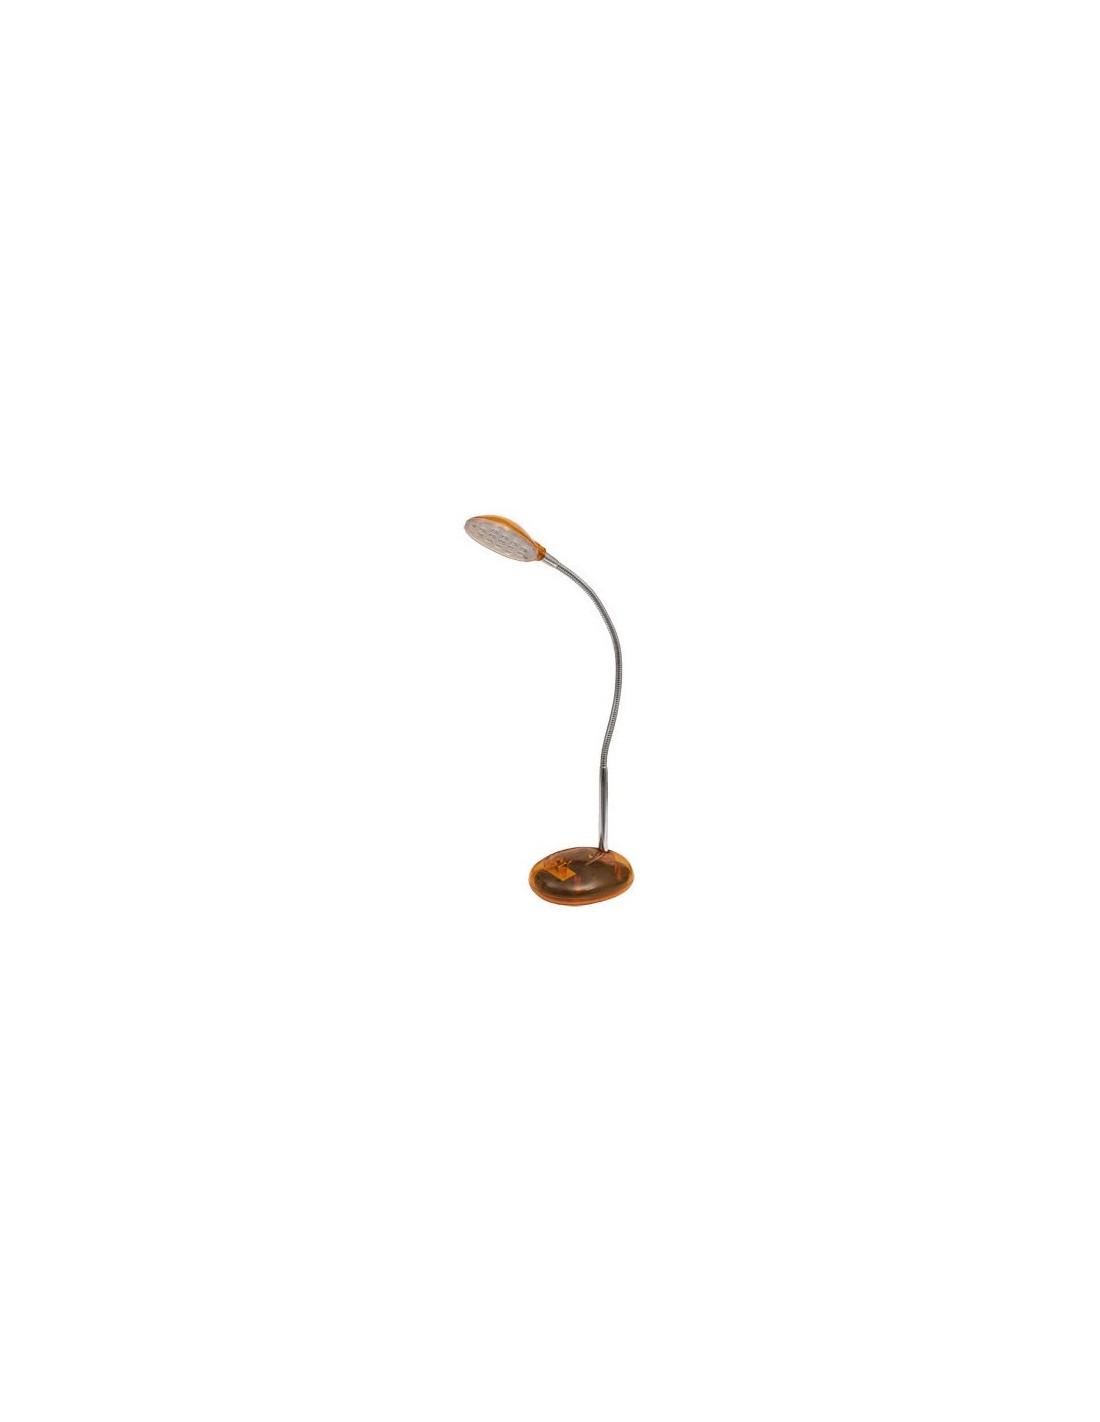 acheter ampoules led g9 076403071. Black Bedroom Furniture Sets. Home Design Ideas